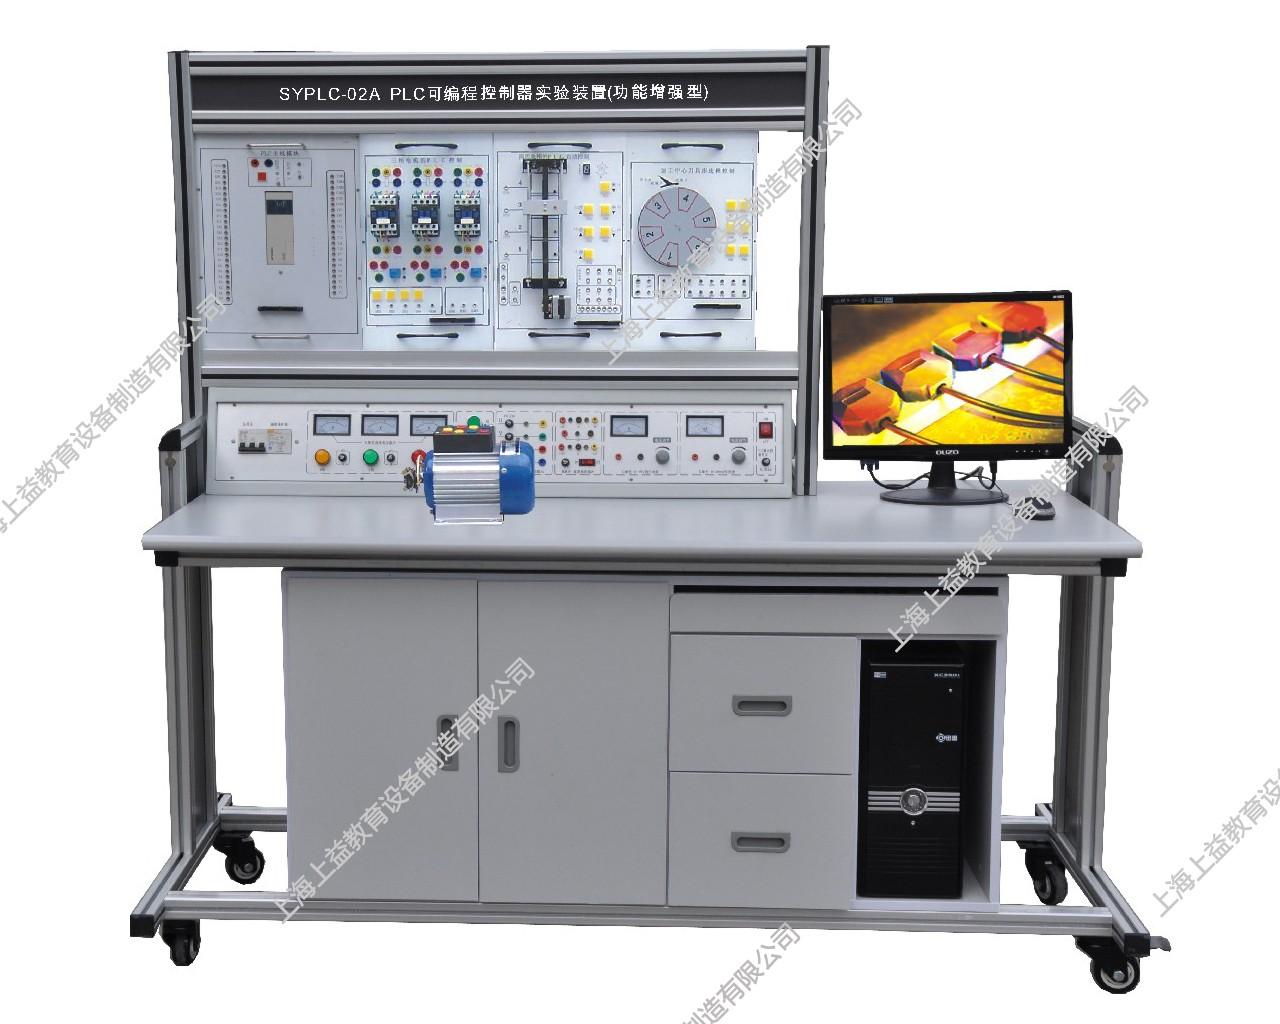 SYPLX-01APLC可编程控制器wwwlehu8vip装置(PLC+电气控制)